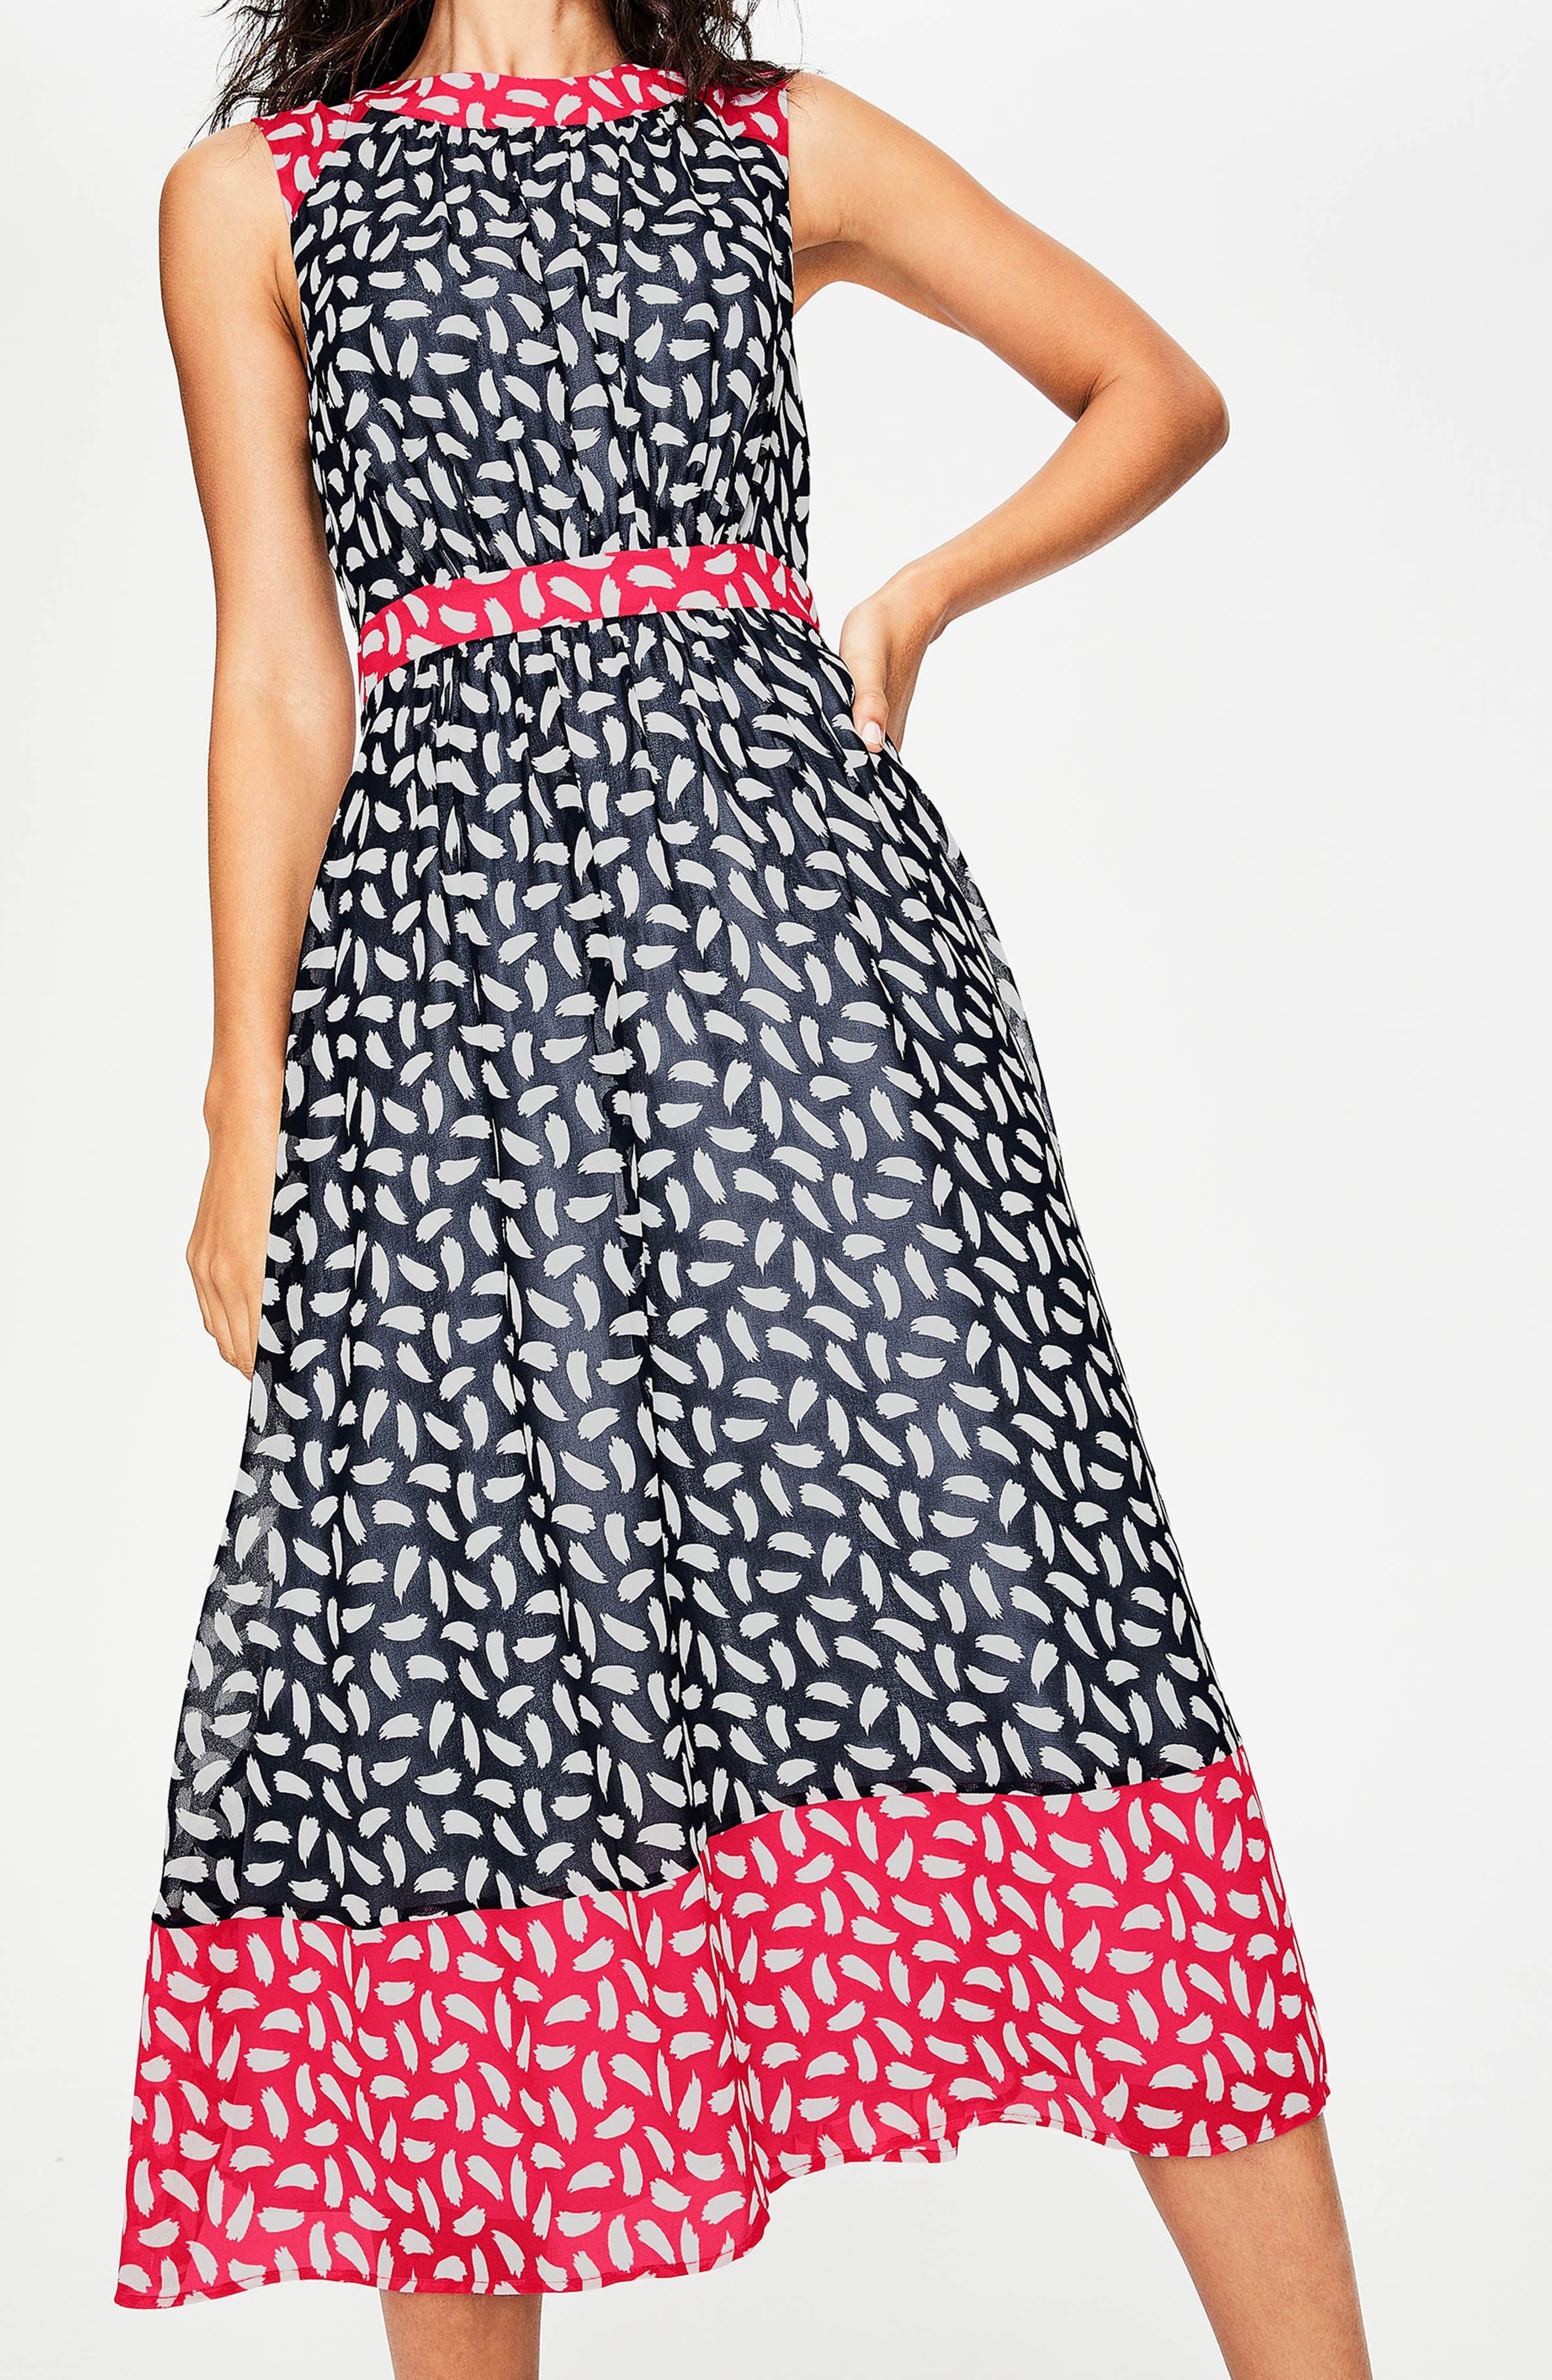 BODEN,                             Sylvie Print Sleeveless Dress,                             Alternate thumbnail 3, color,                             414